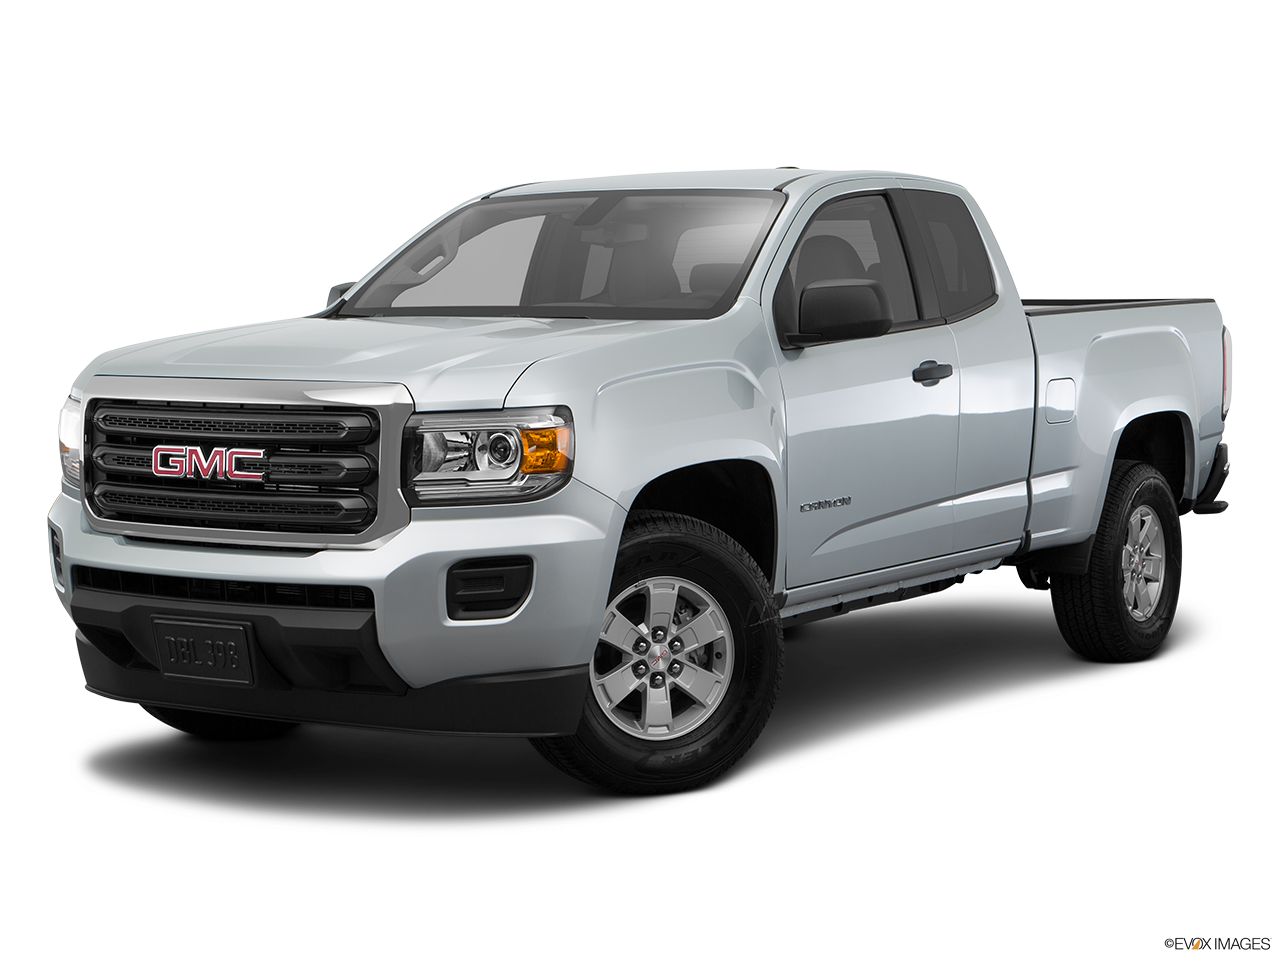 2016 Gmc Canyon Dealer In Orange County Hardin Buick 2010 Chevy Silverado 1500 Engine Diagram Test Drive A At Anaheim